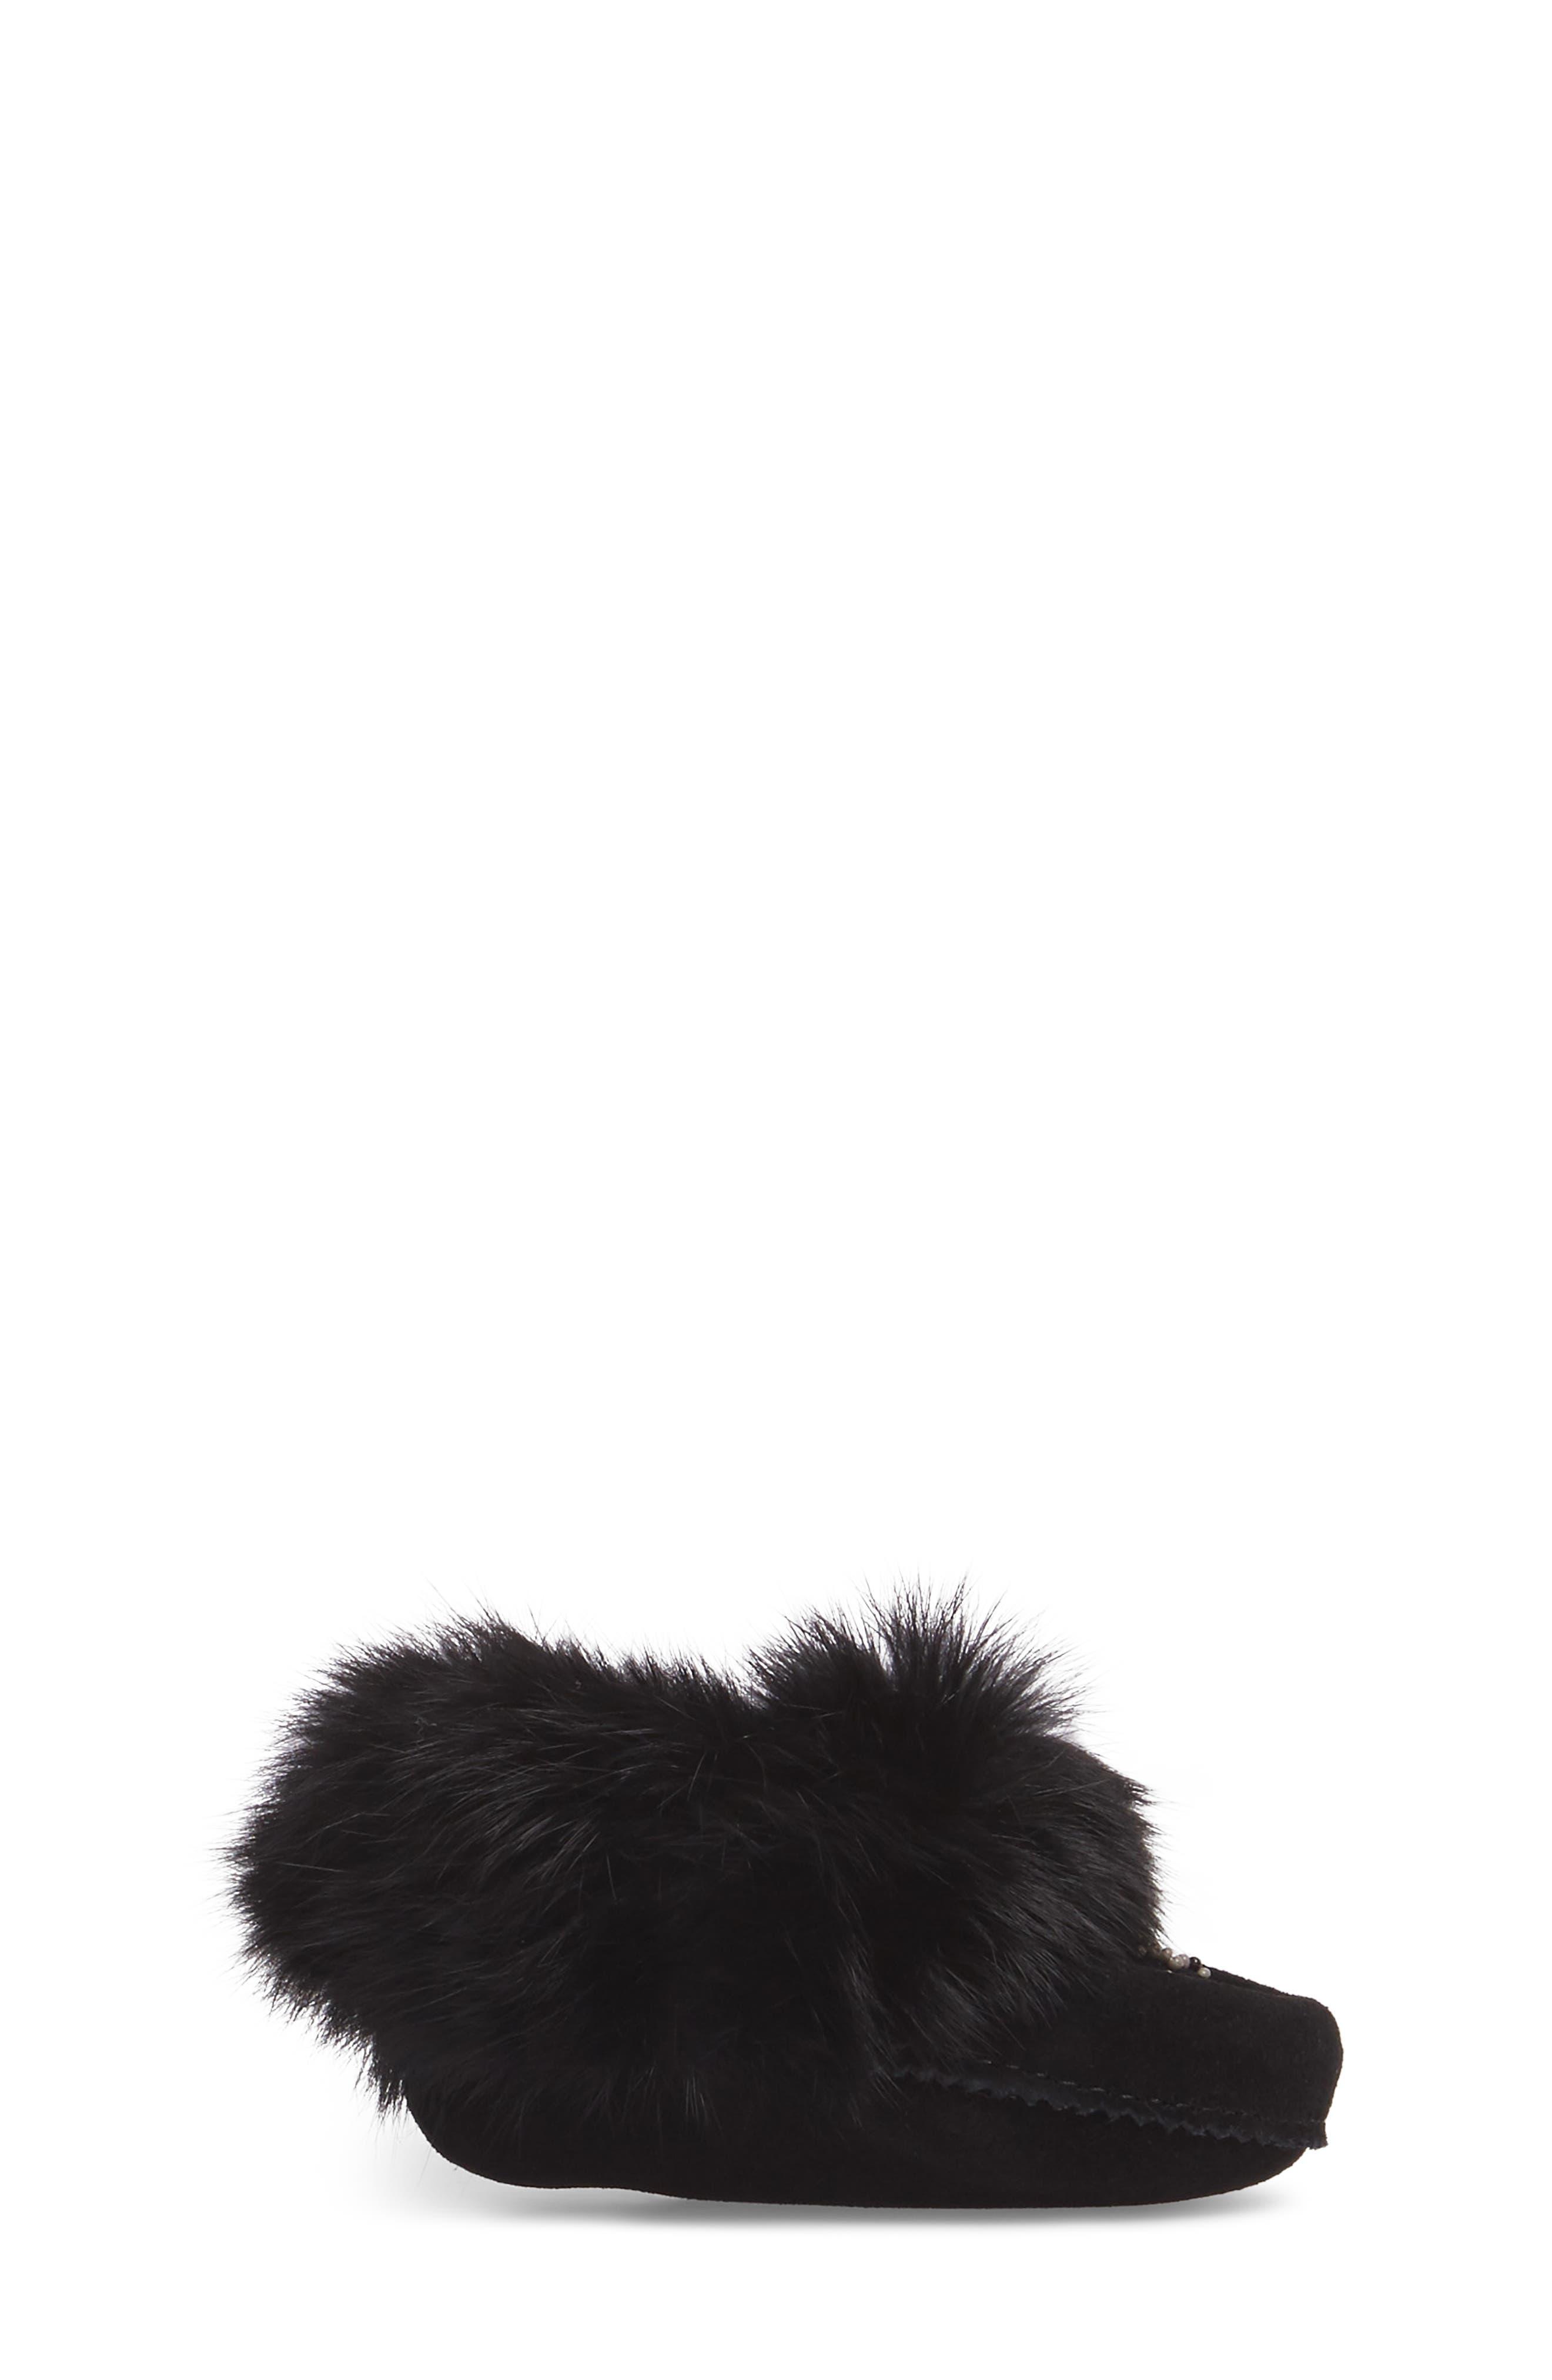 Genuine Rabbit Fur Moccasin,                             Alternate thumbnail 12, color,